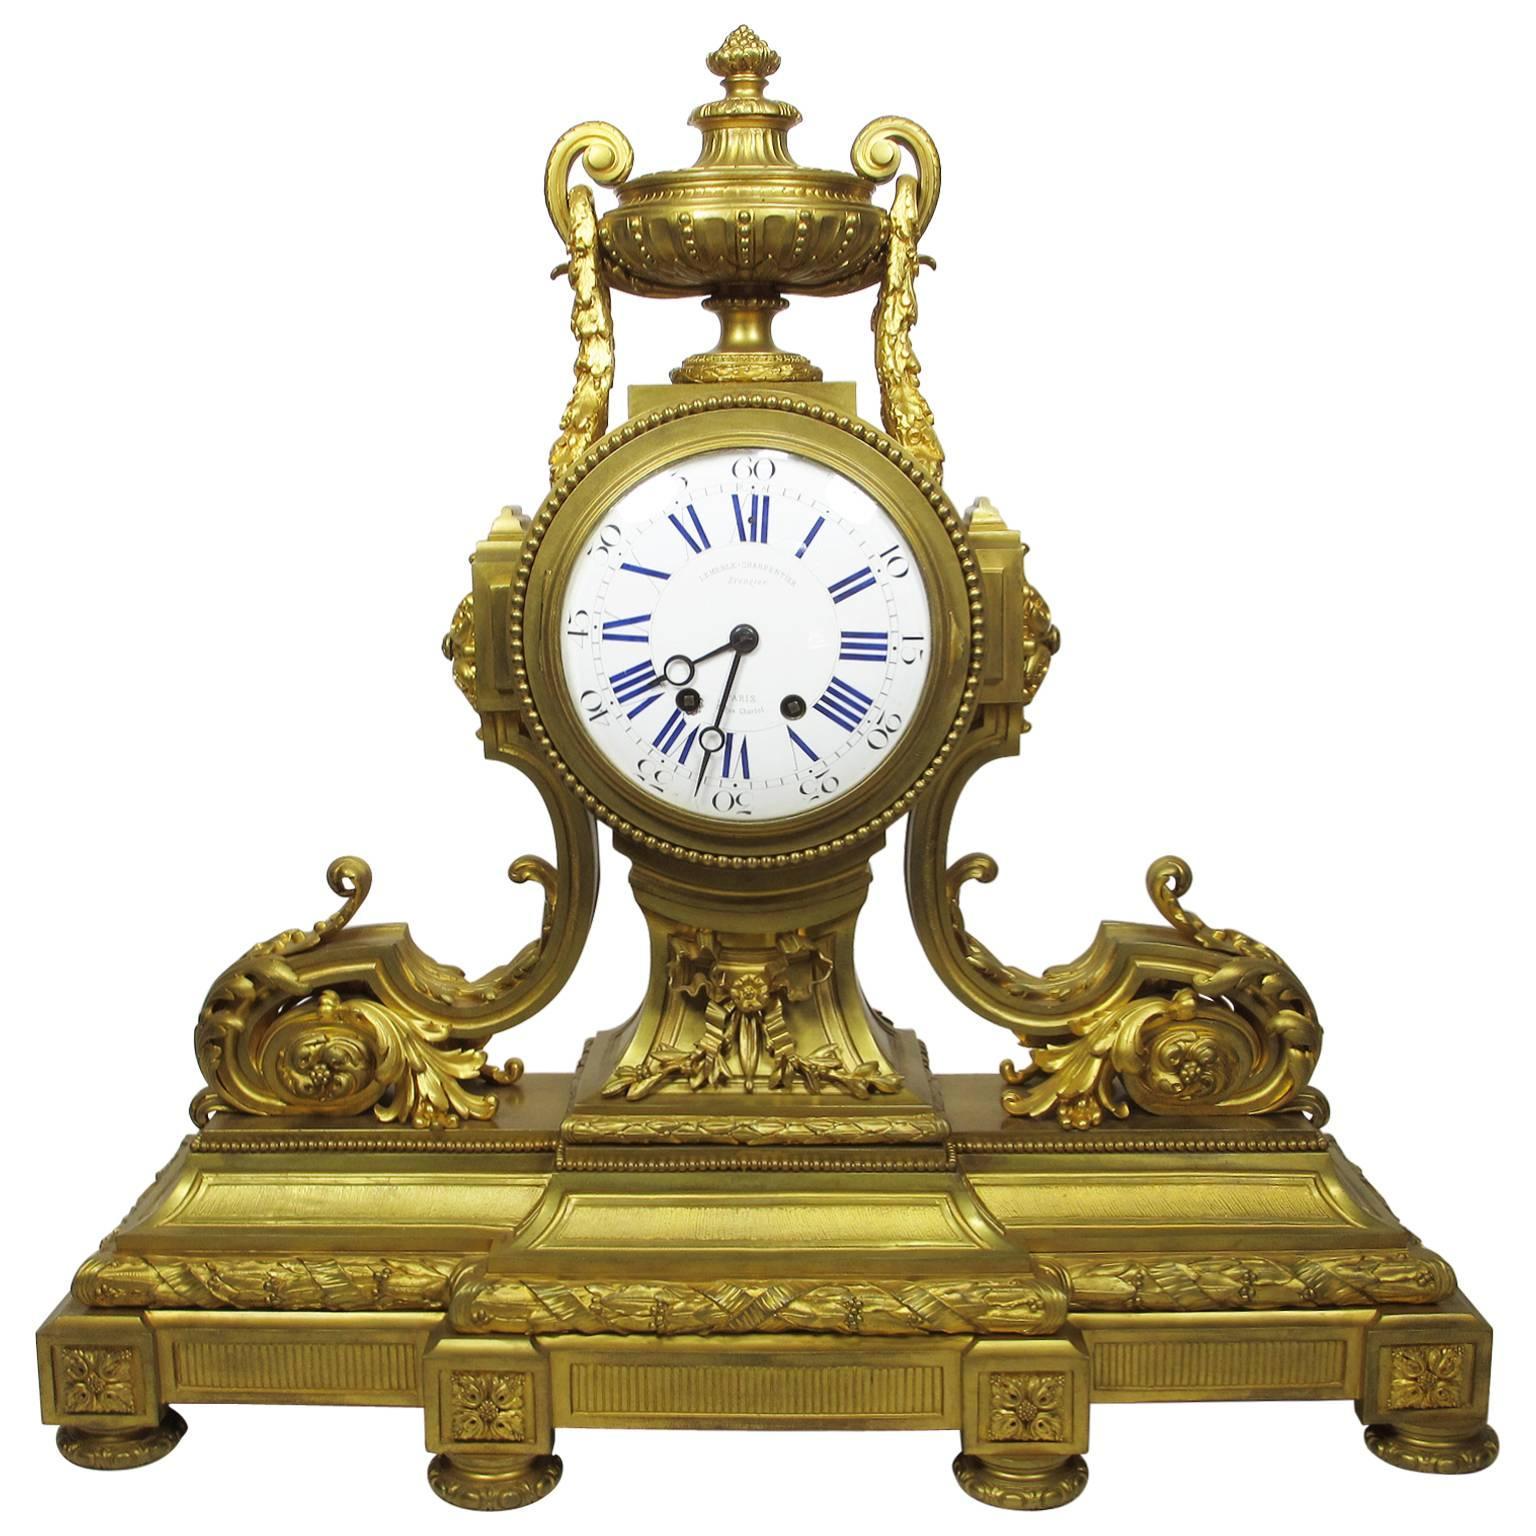 19th Century Louis XVI Style Gilt Bronze Mantel Clock by Lemerle Charpentier